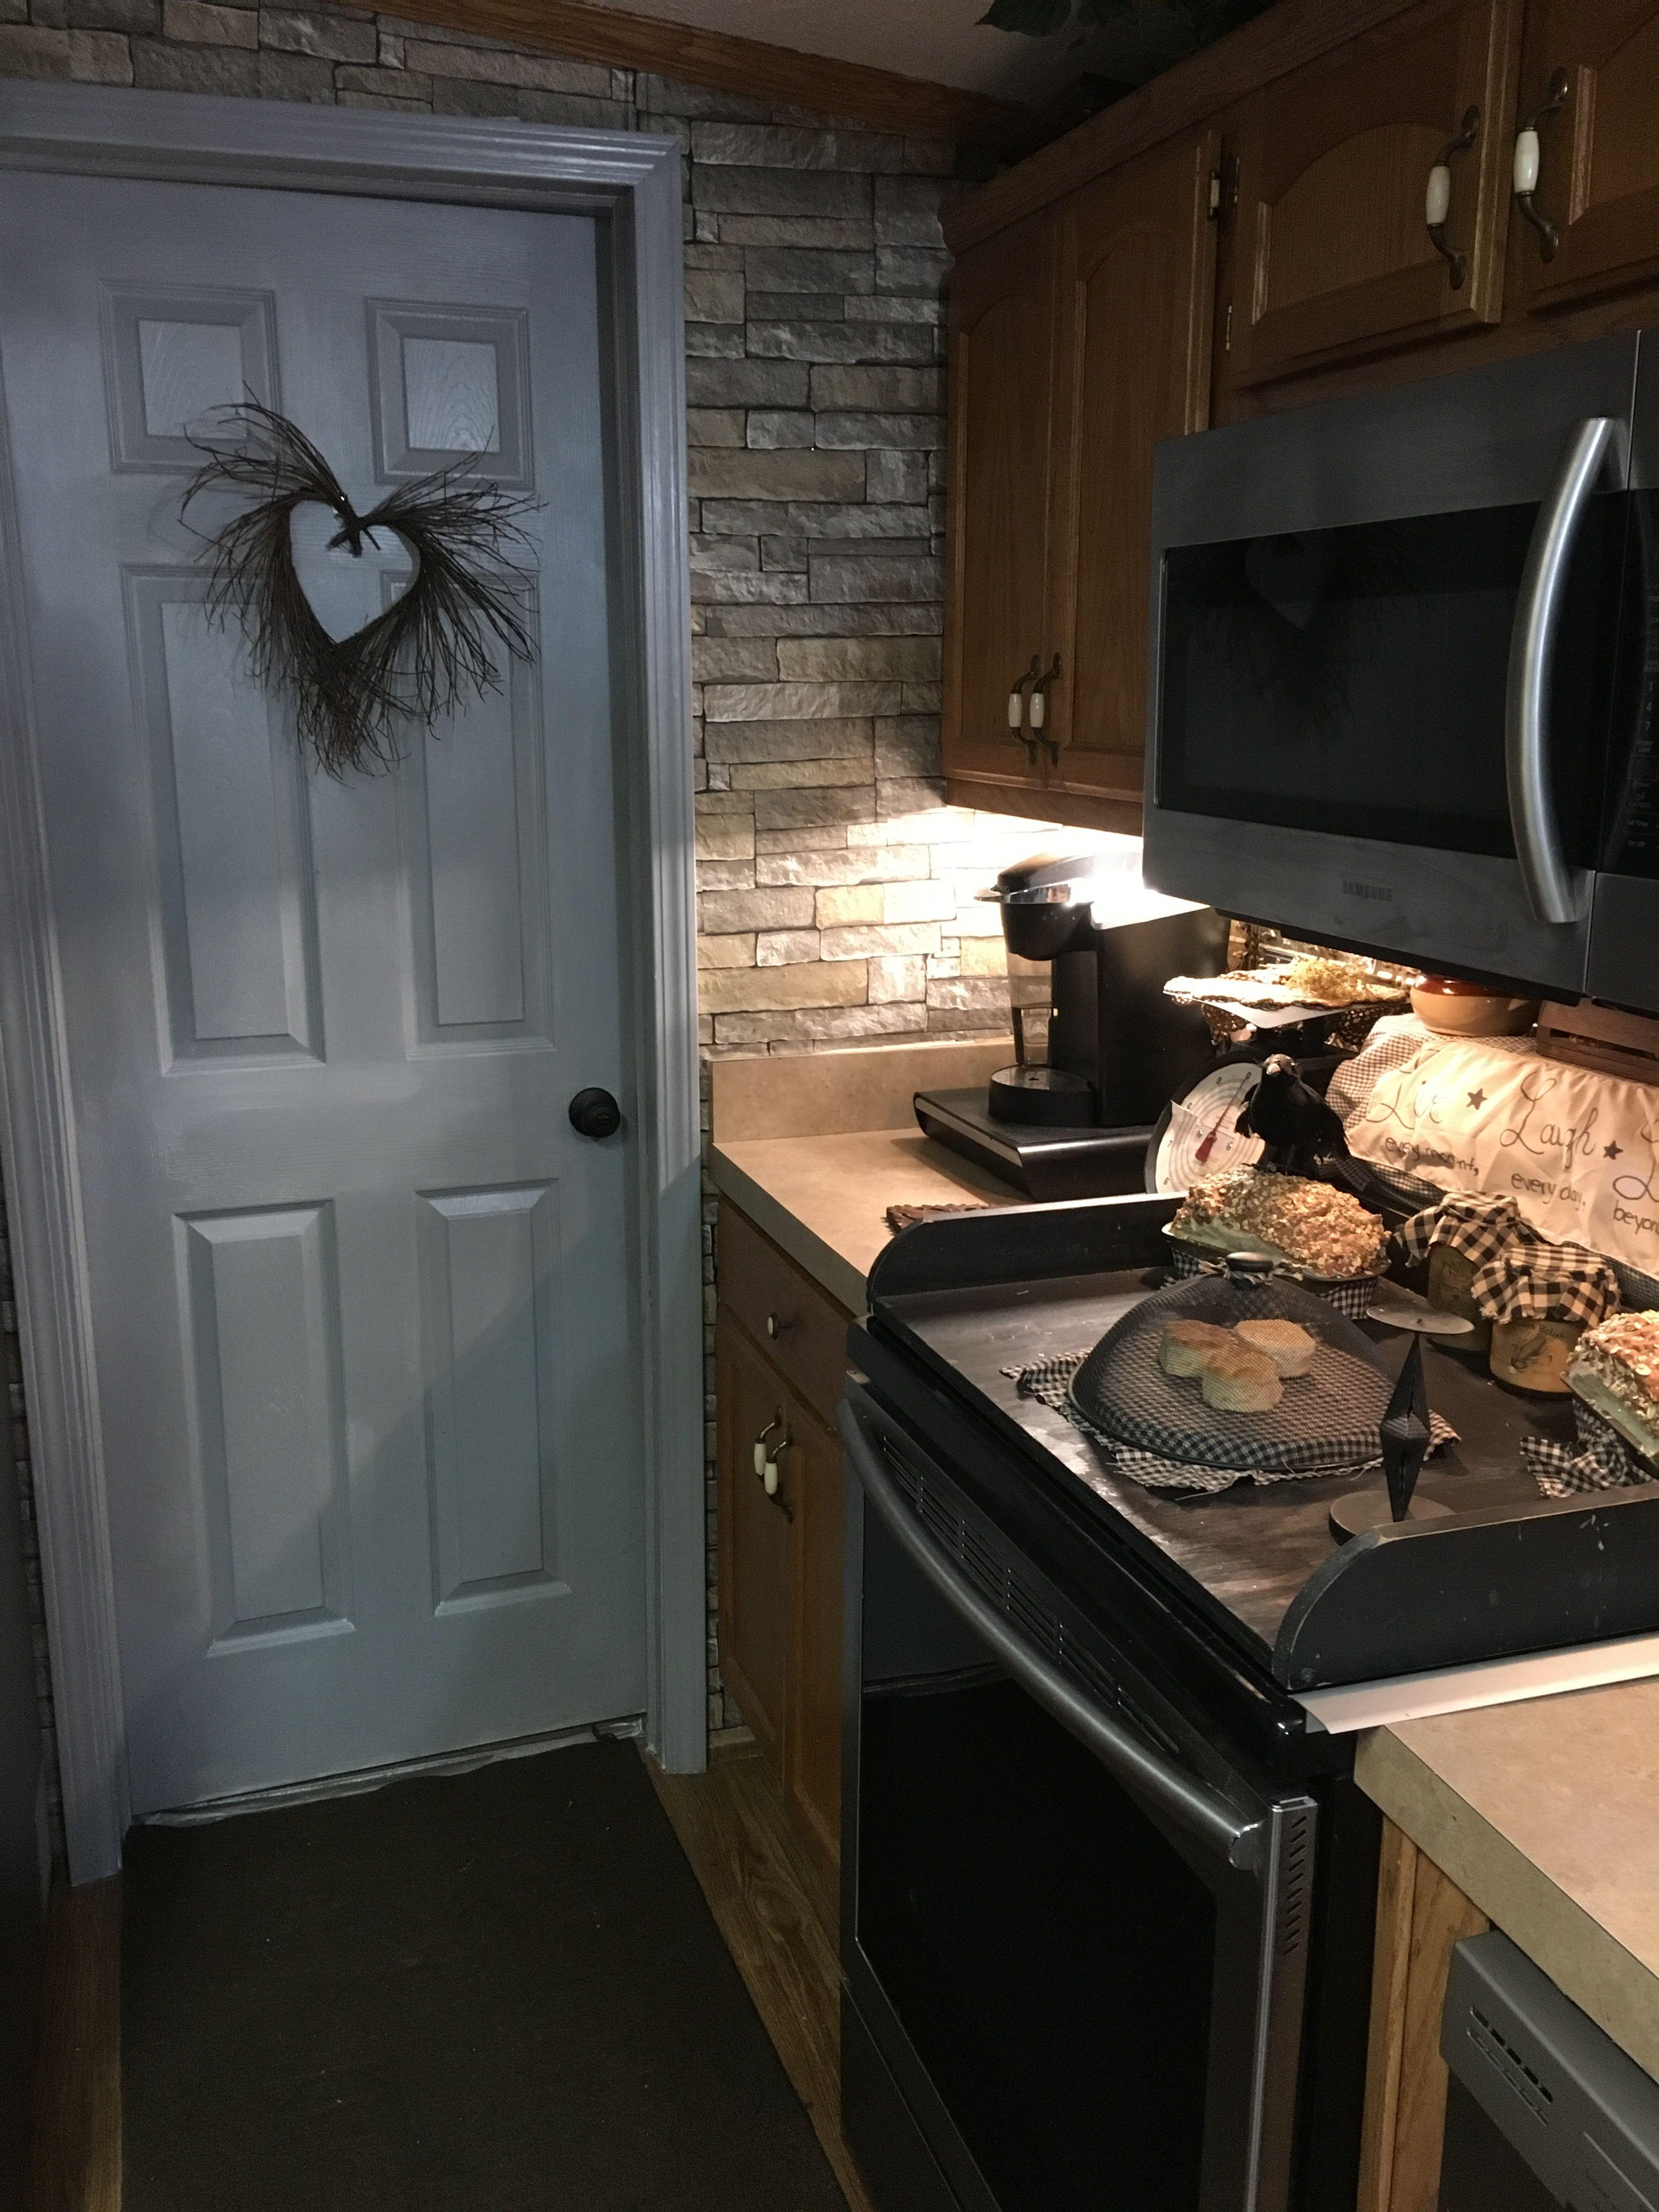 Mobile home living primitive style | Primitive kitchen ...